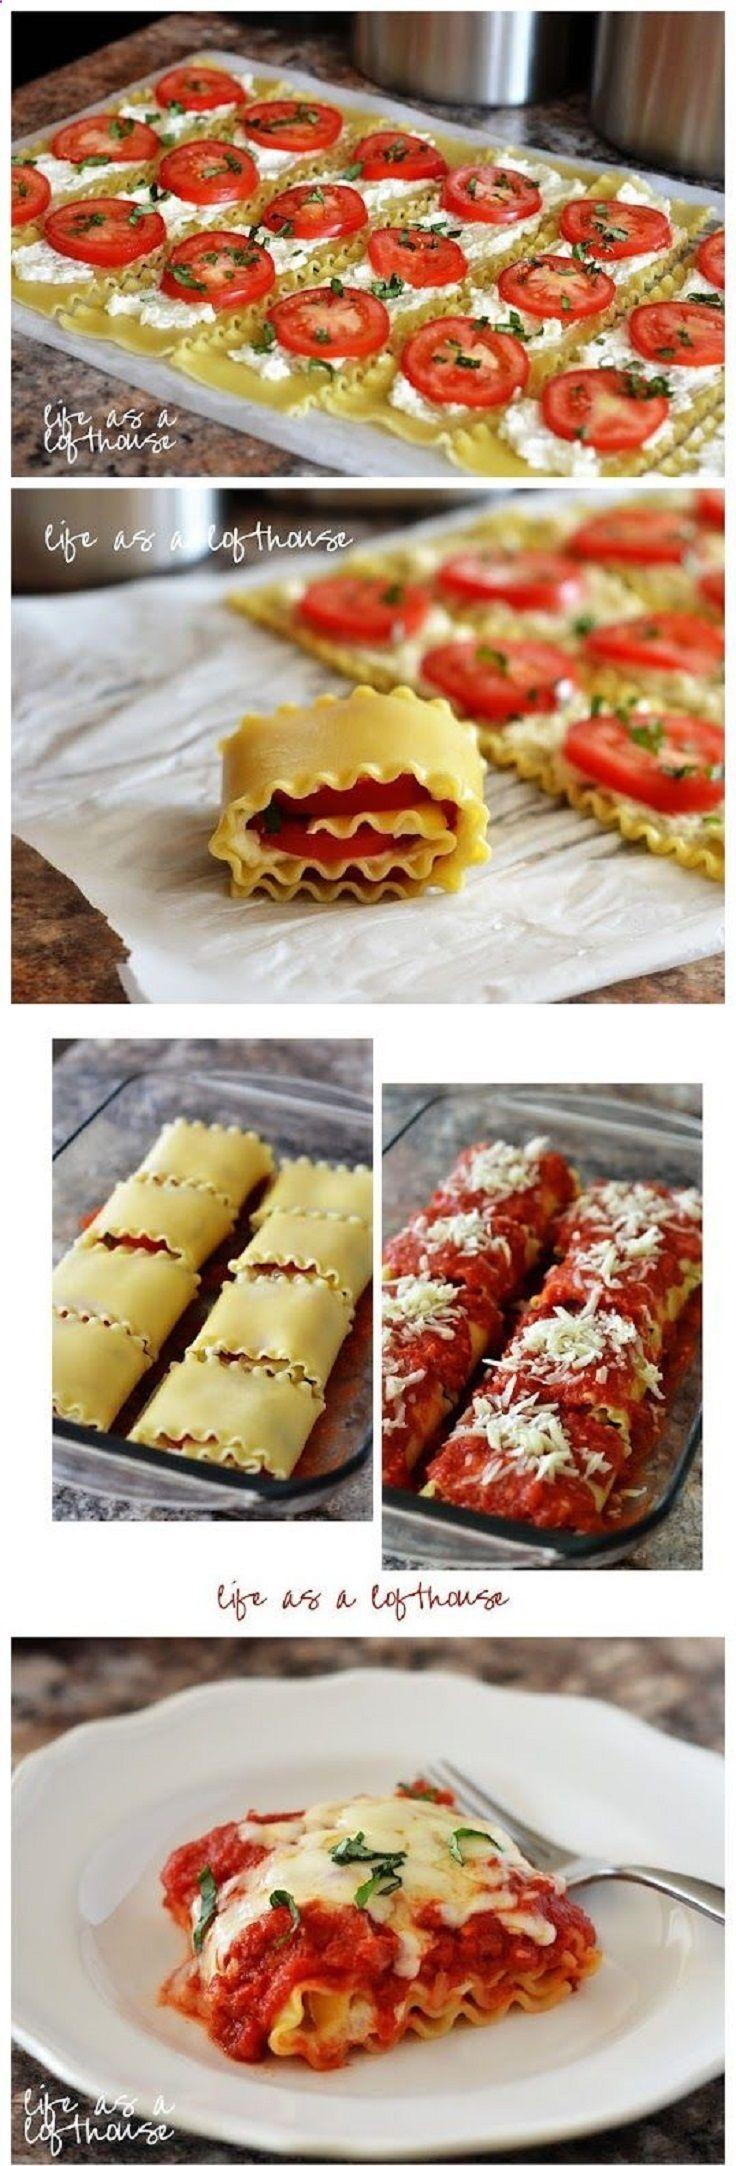 12 Top Rated Italian Recipes | FOODIEZ-eatzFOODIEZ-eatz